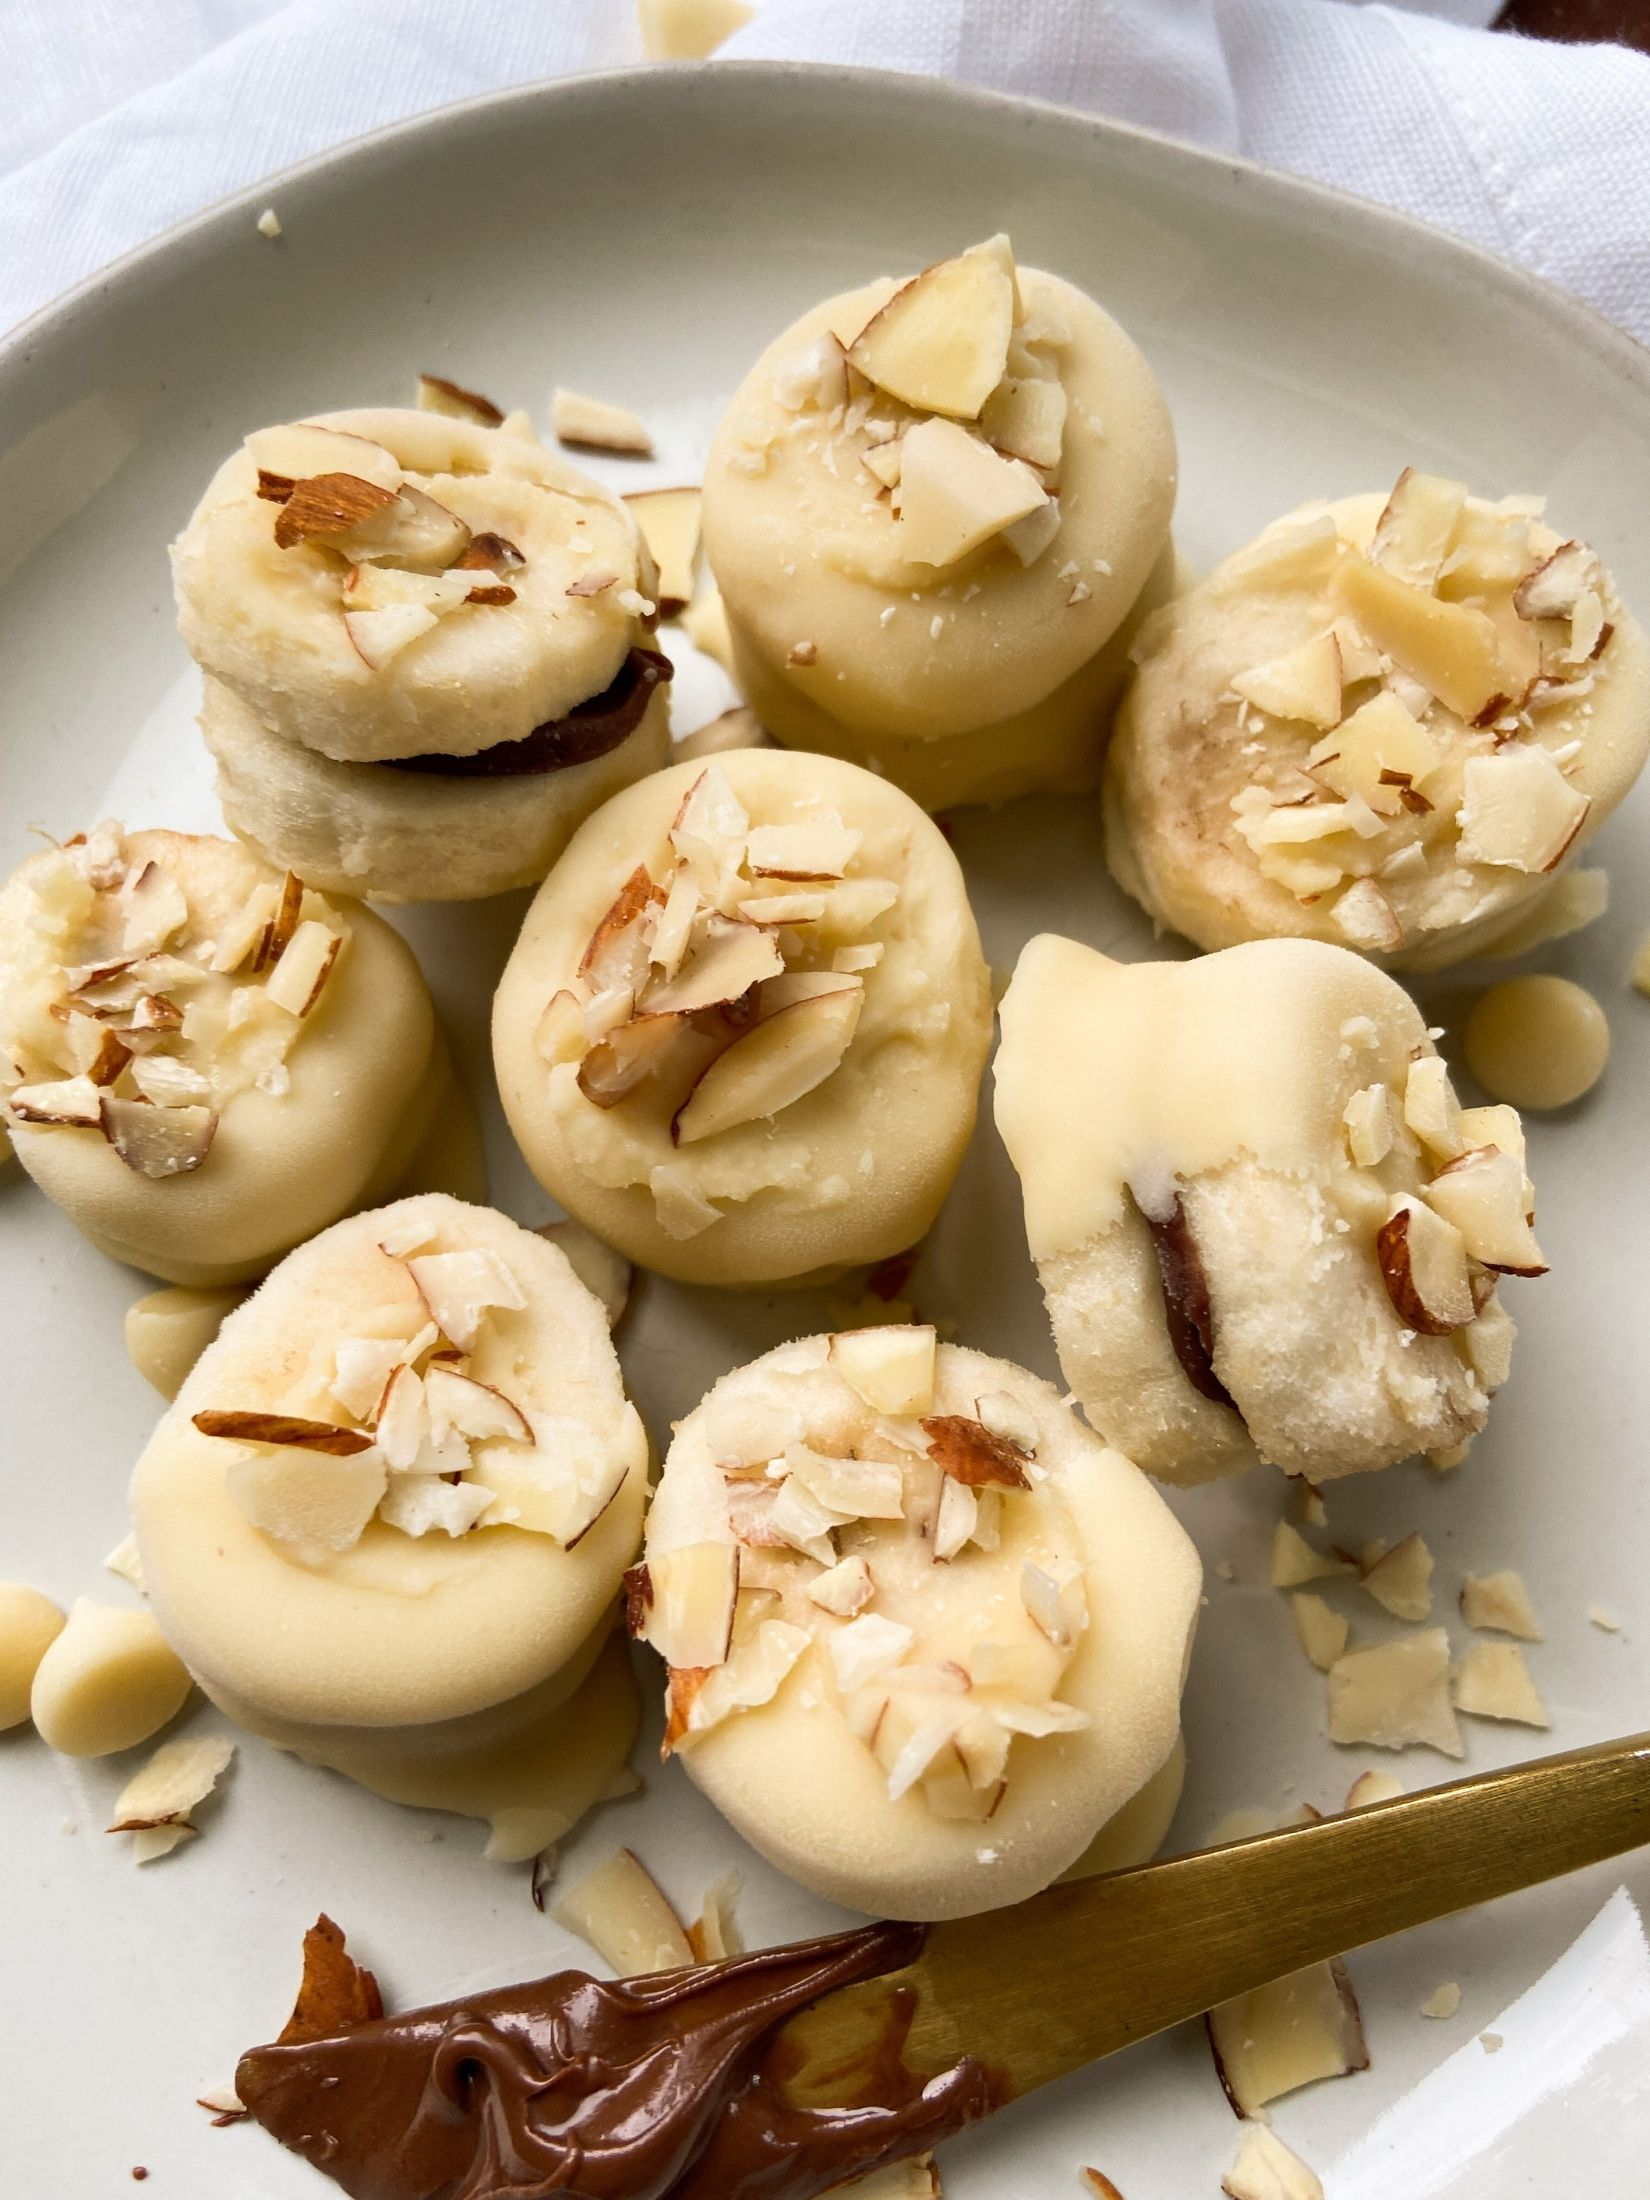 Chocolate Tahini White Choco Covered Banana Bites Feature